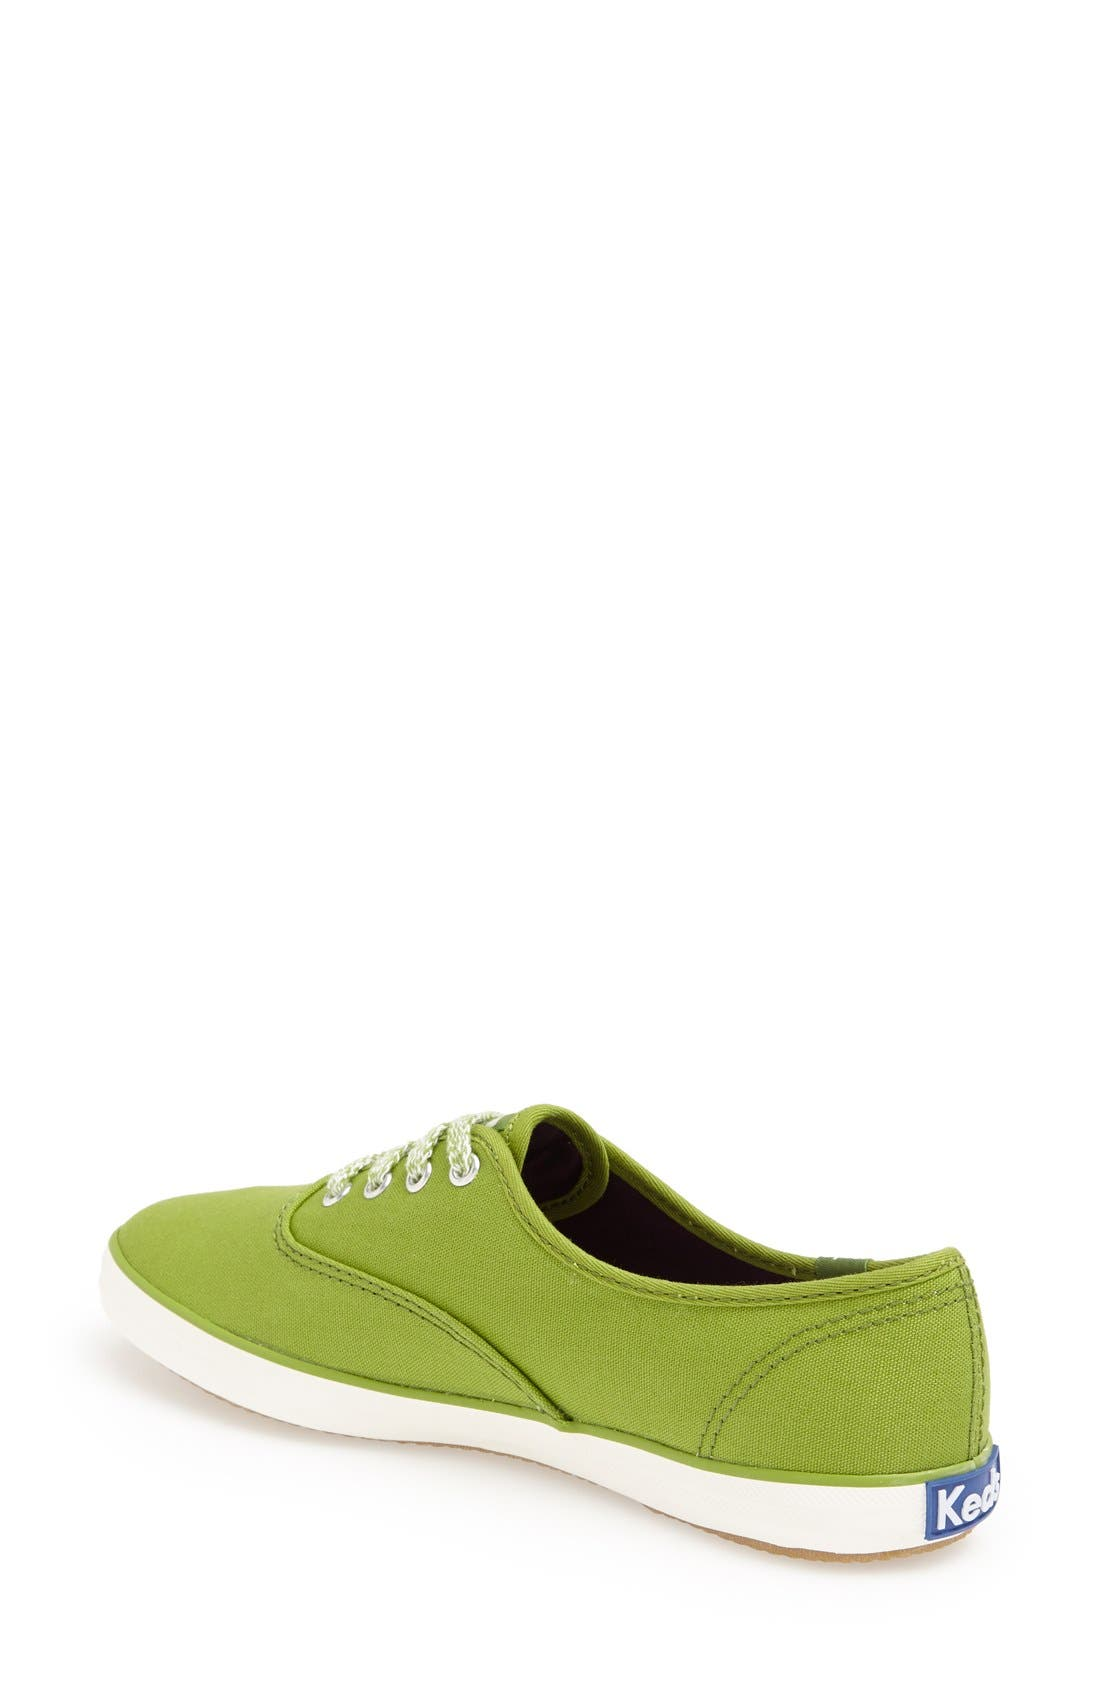 Alternate Image 2  - Keds® 'Champion' Canvas Sneaker (Women)